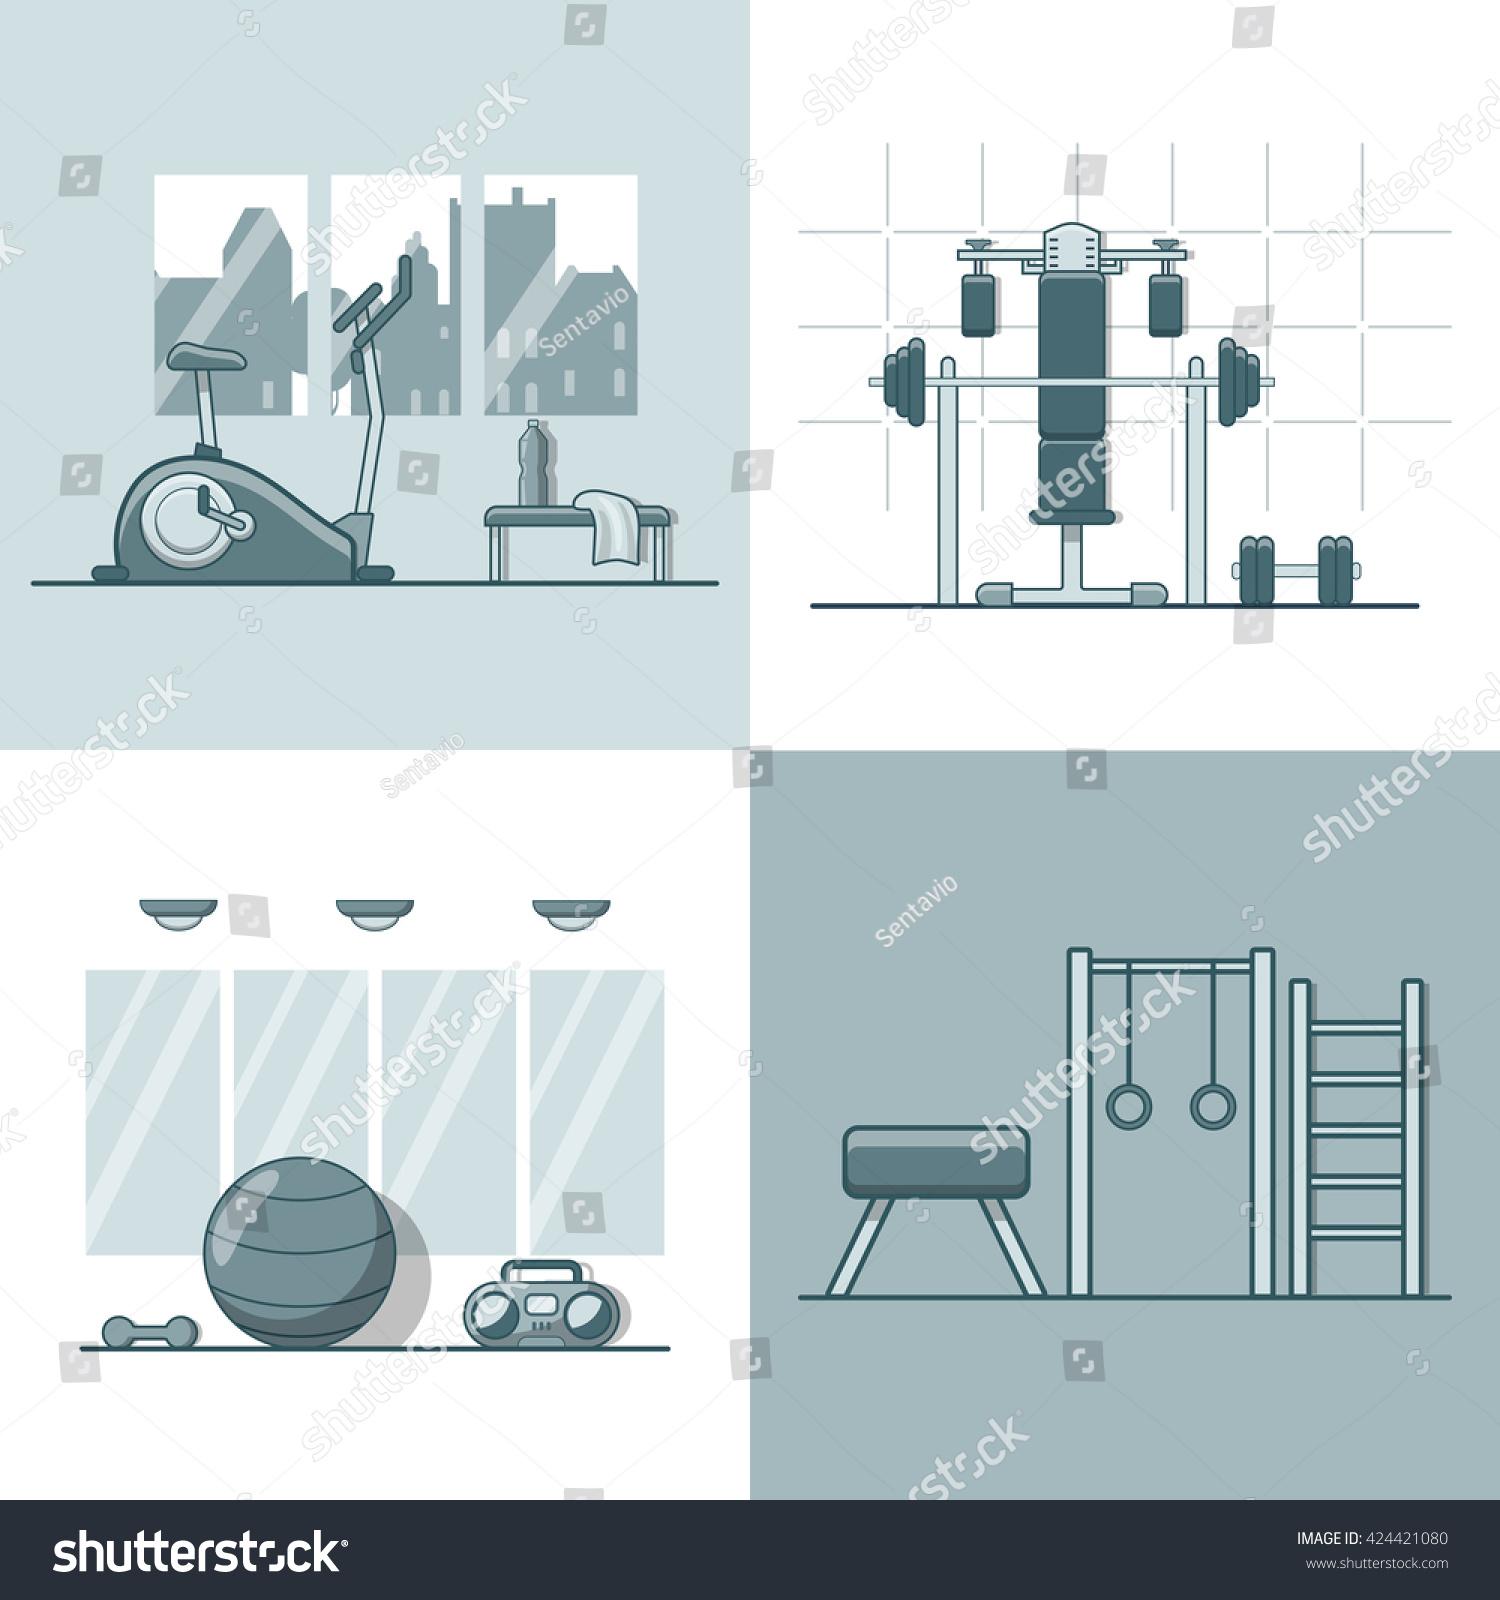 Gym exercise equipment room interior indoor stock vector